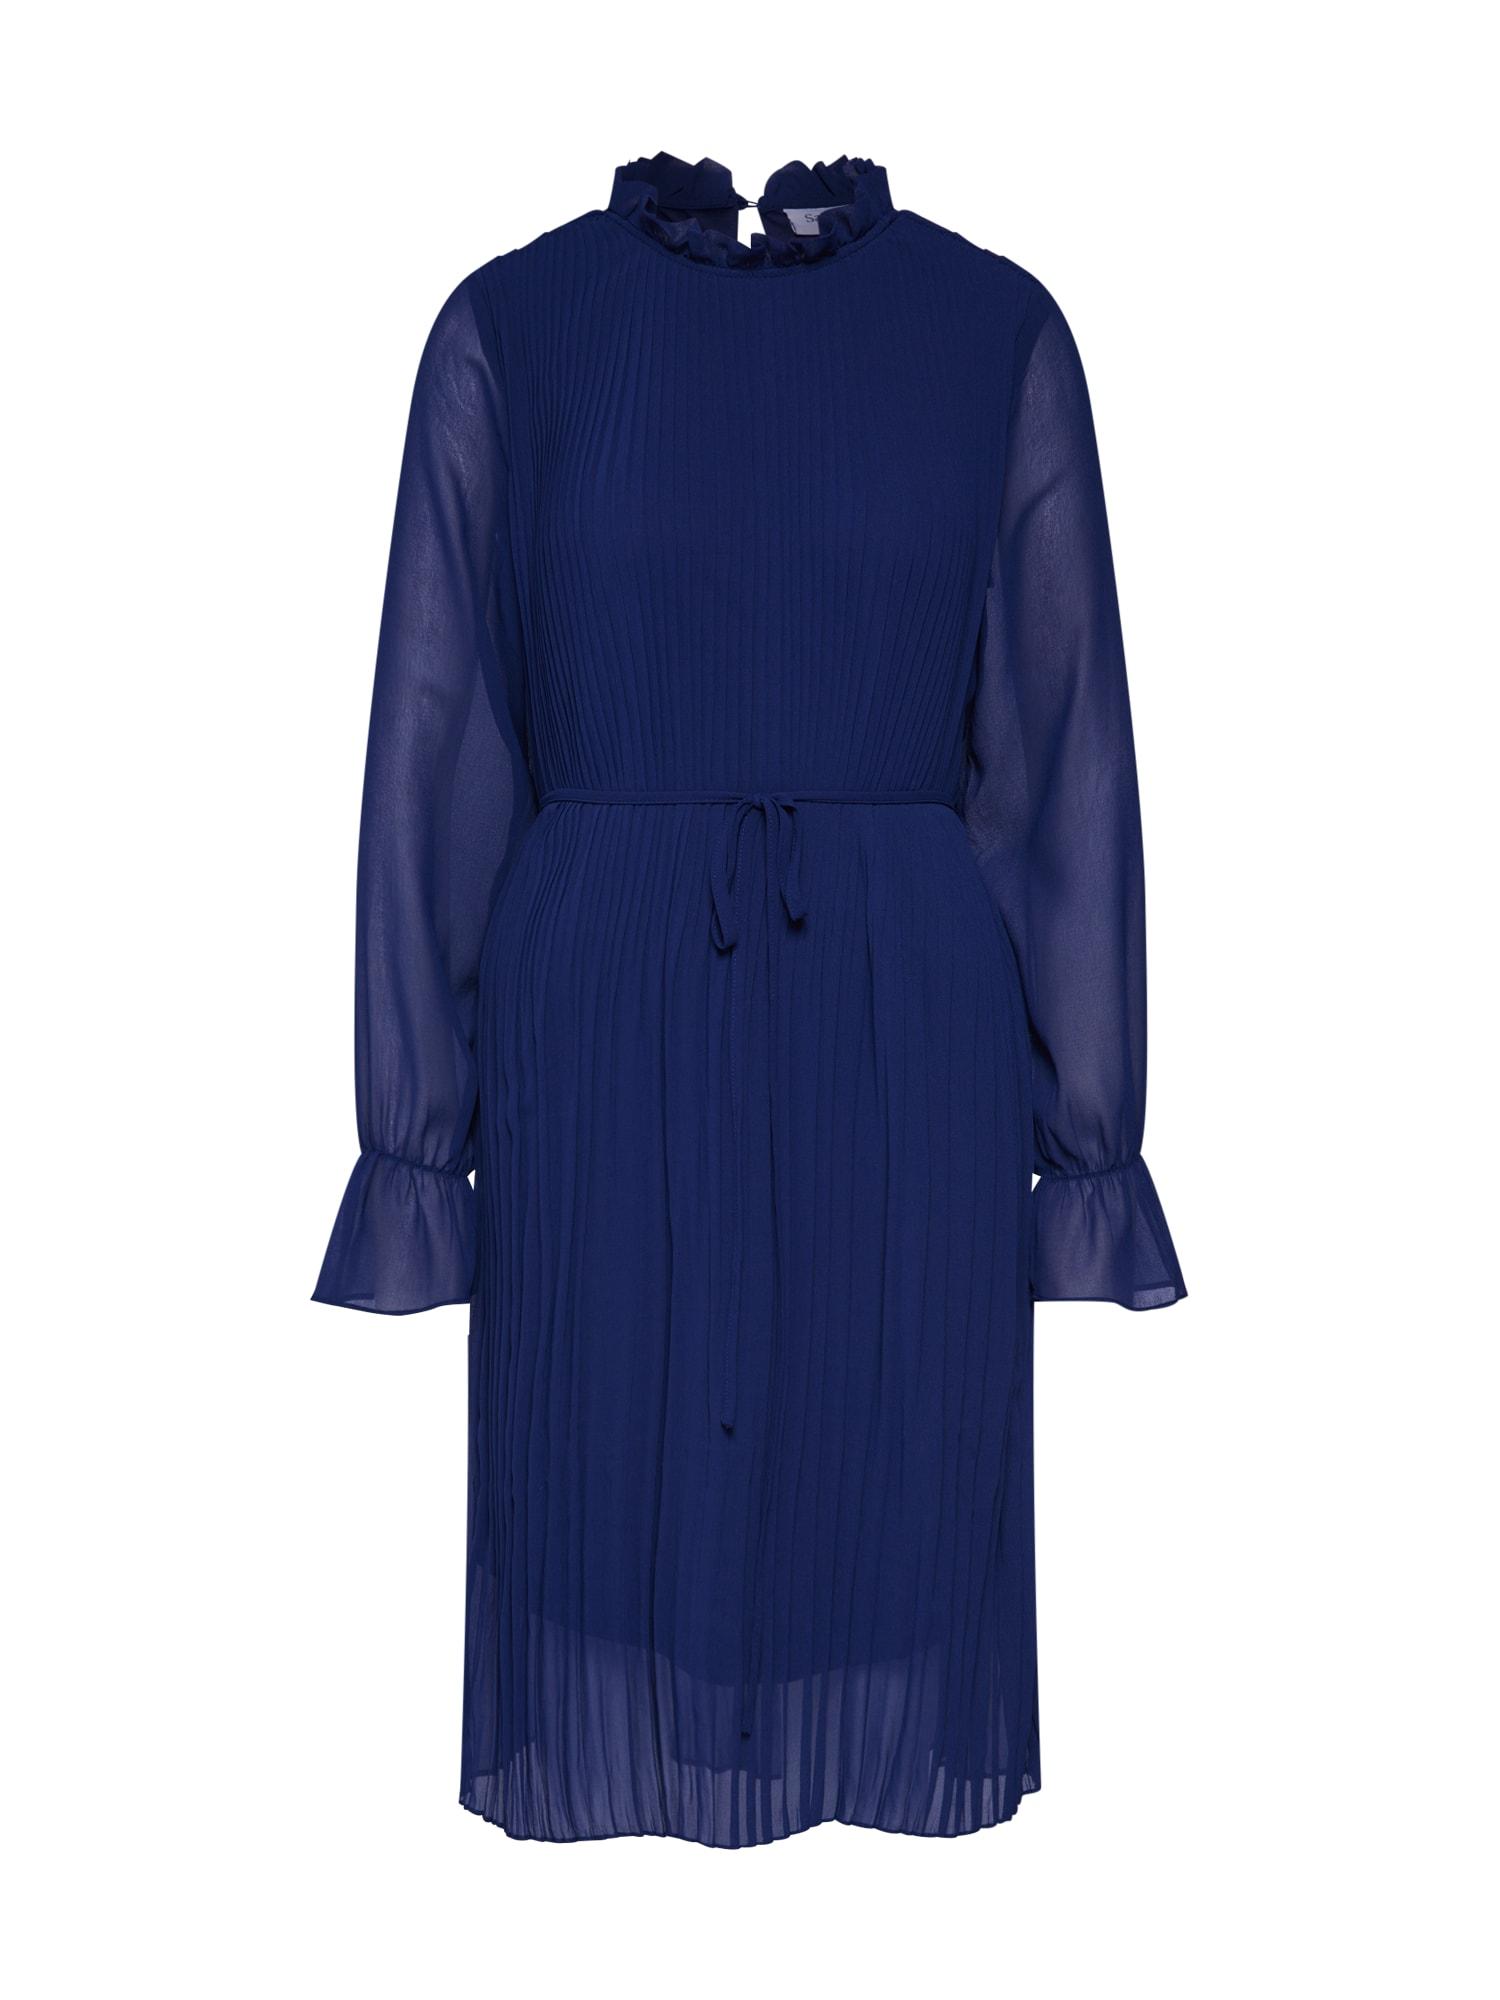 Šaty tmavě modrá SAINT TROPEZ